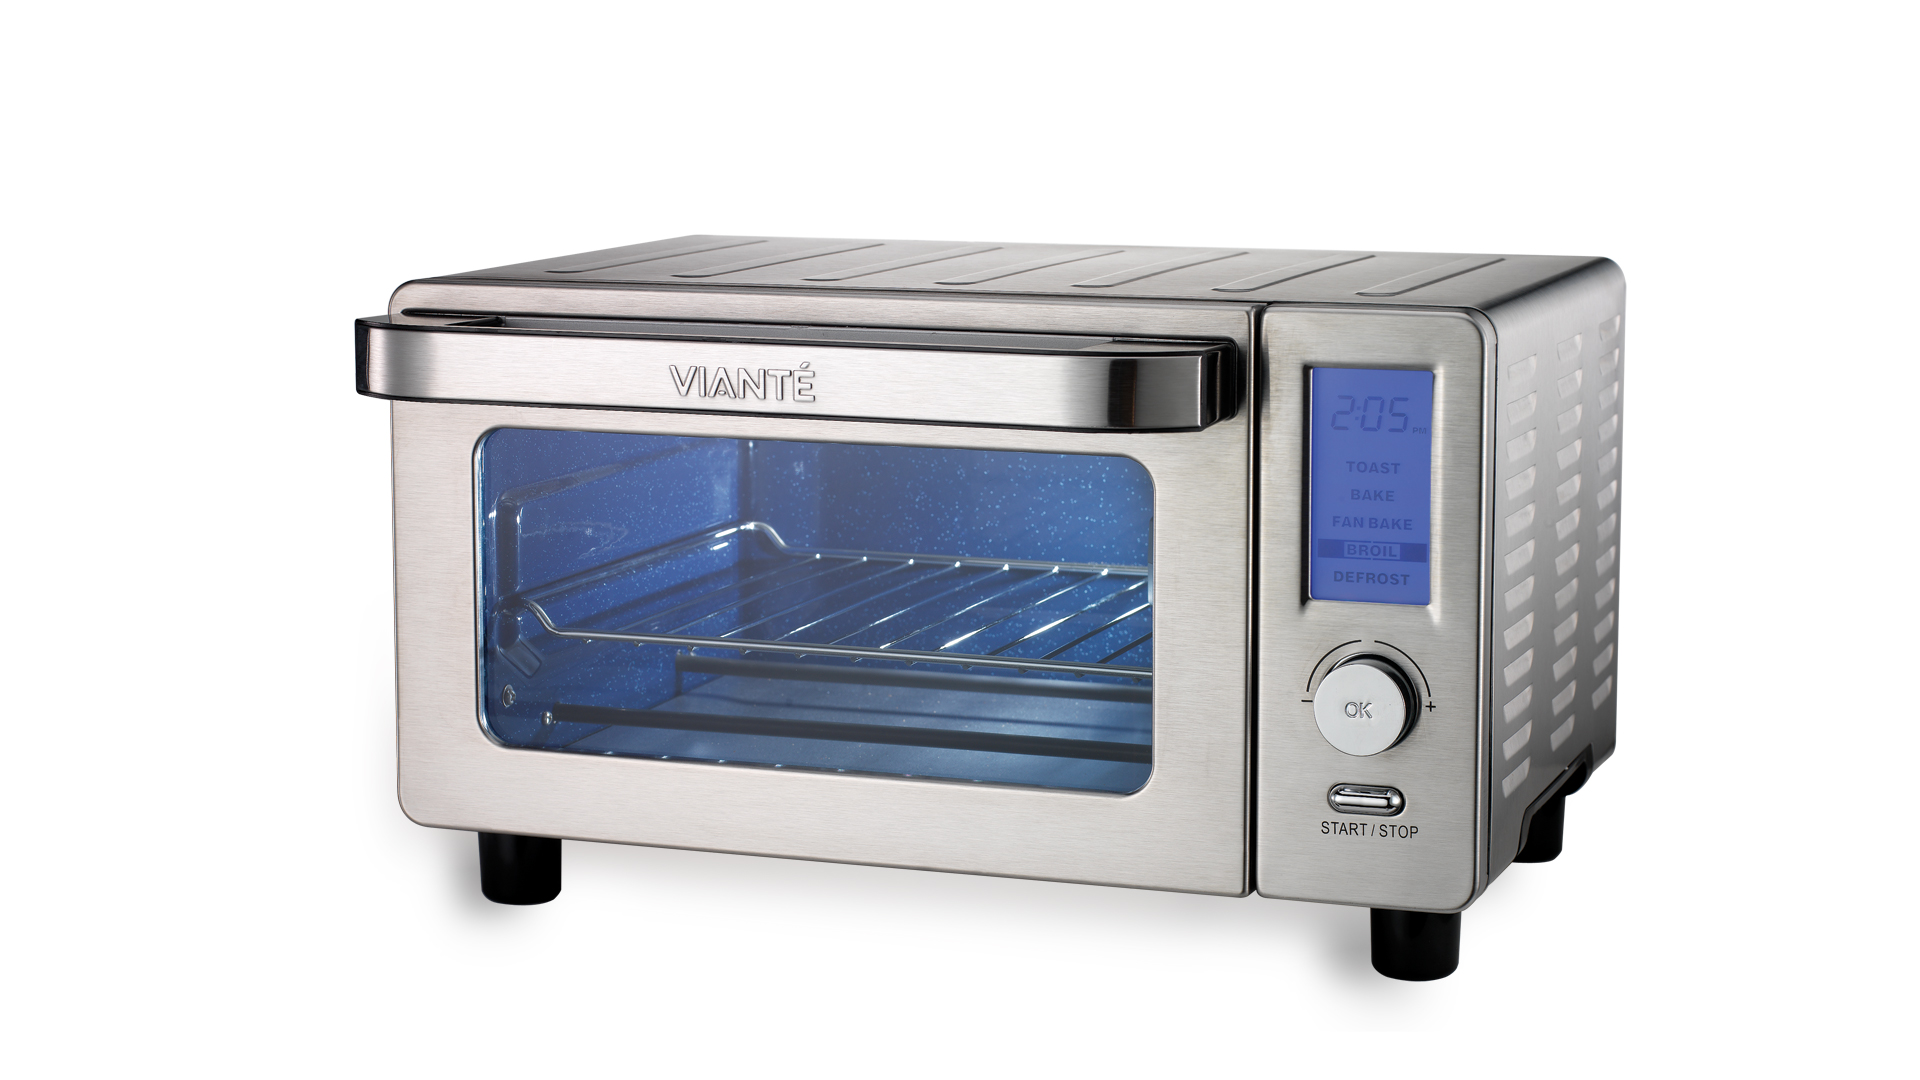 Viante True Blue Convection Toaster Oven Cuc 04e Review